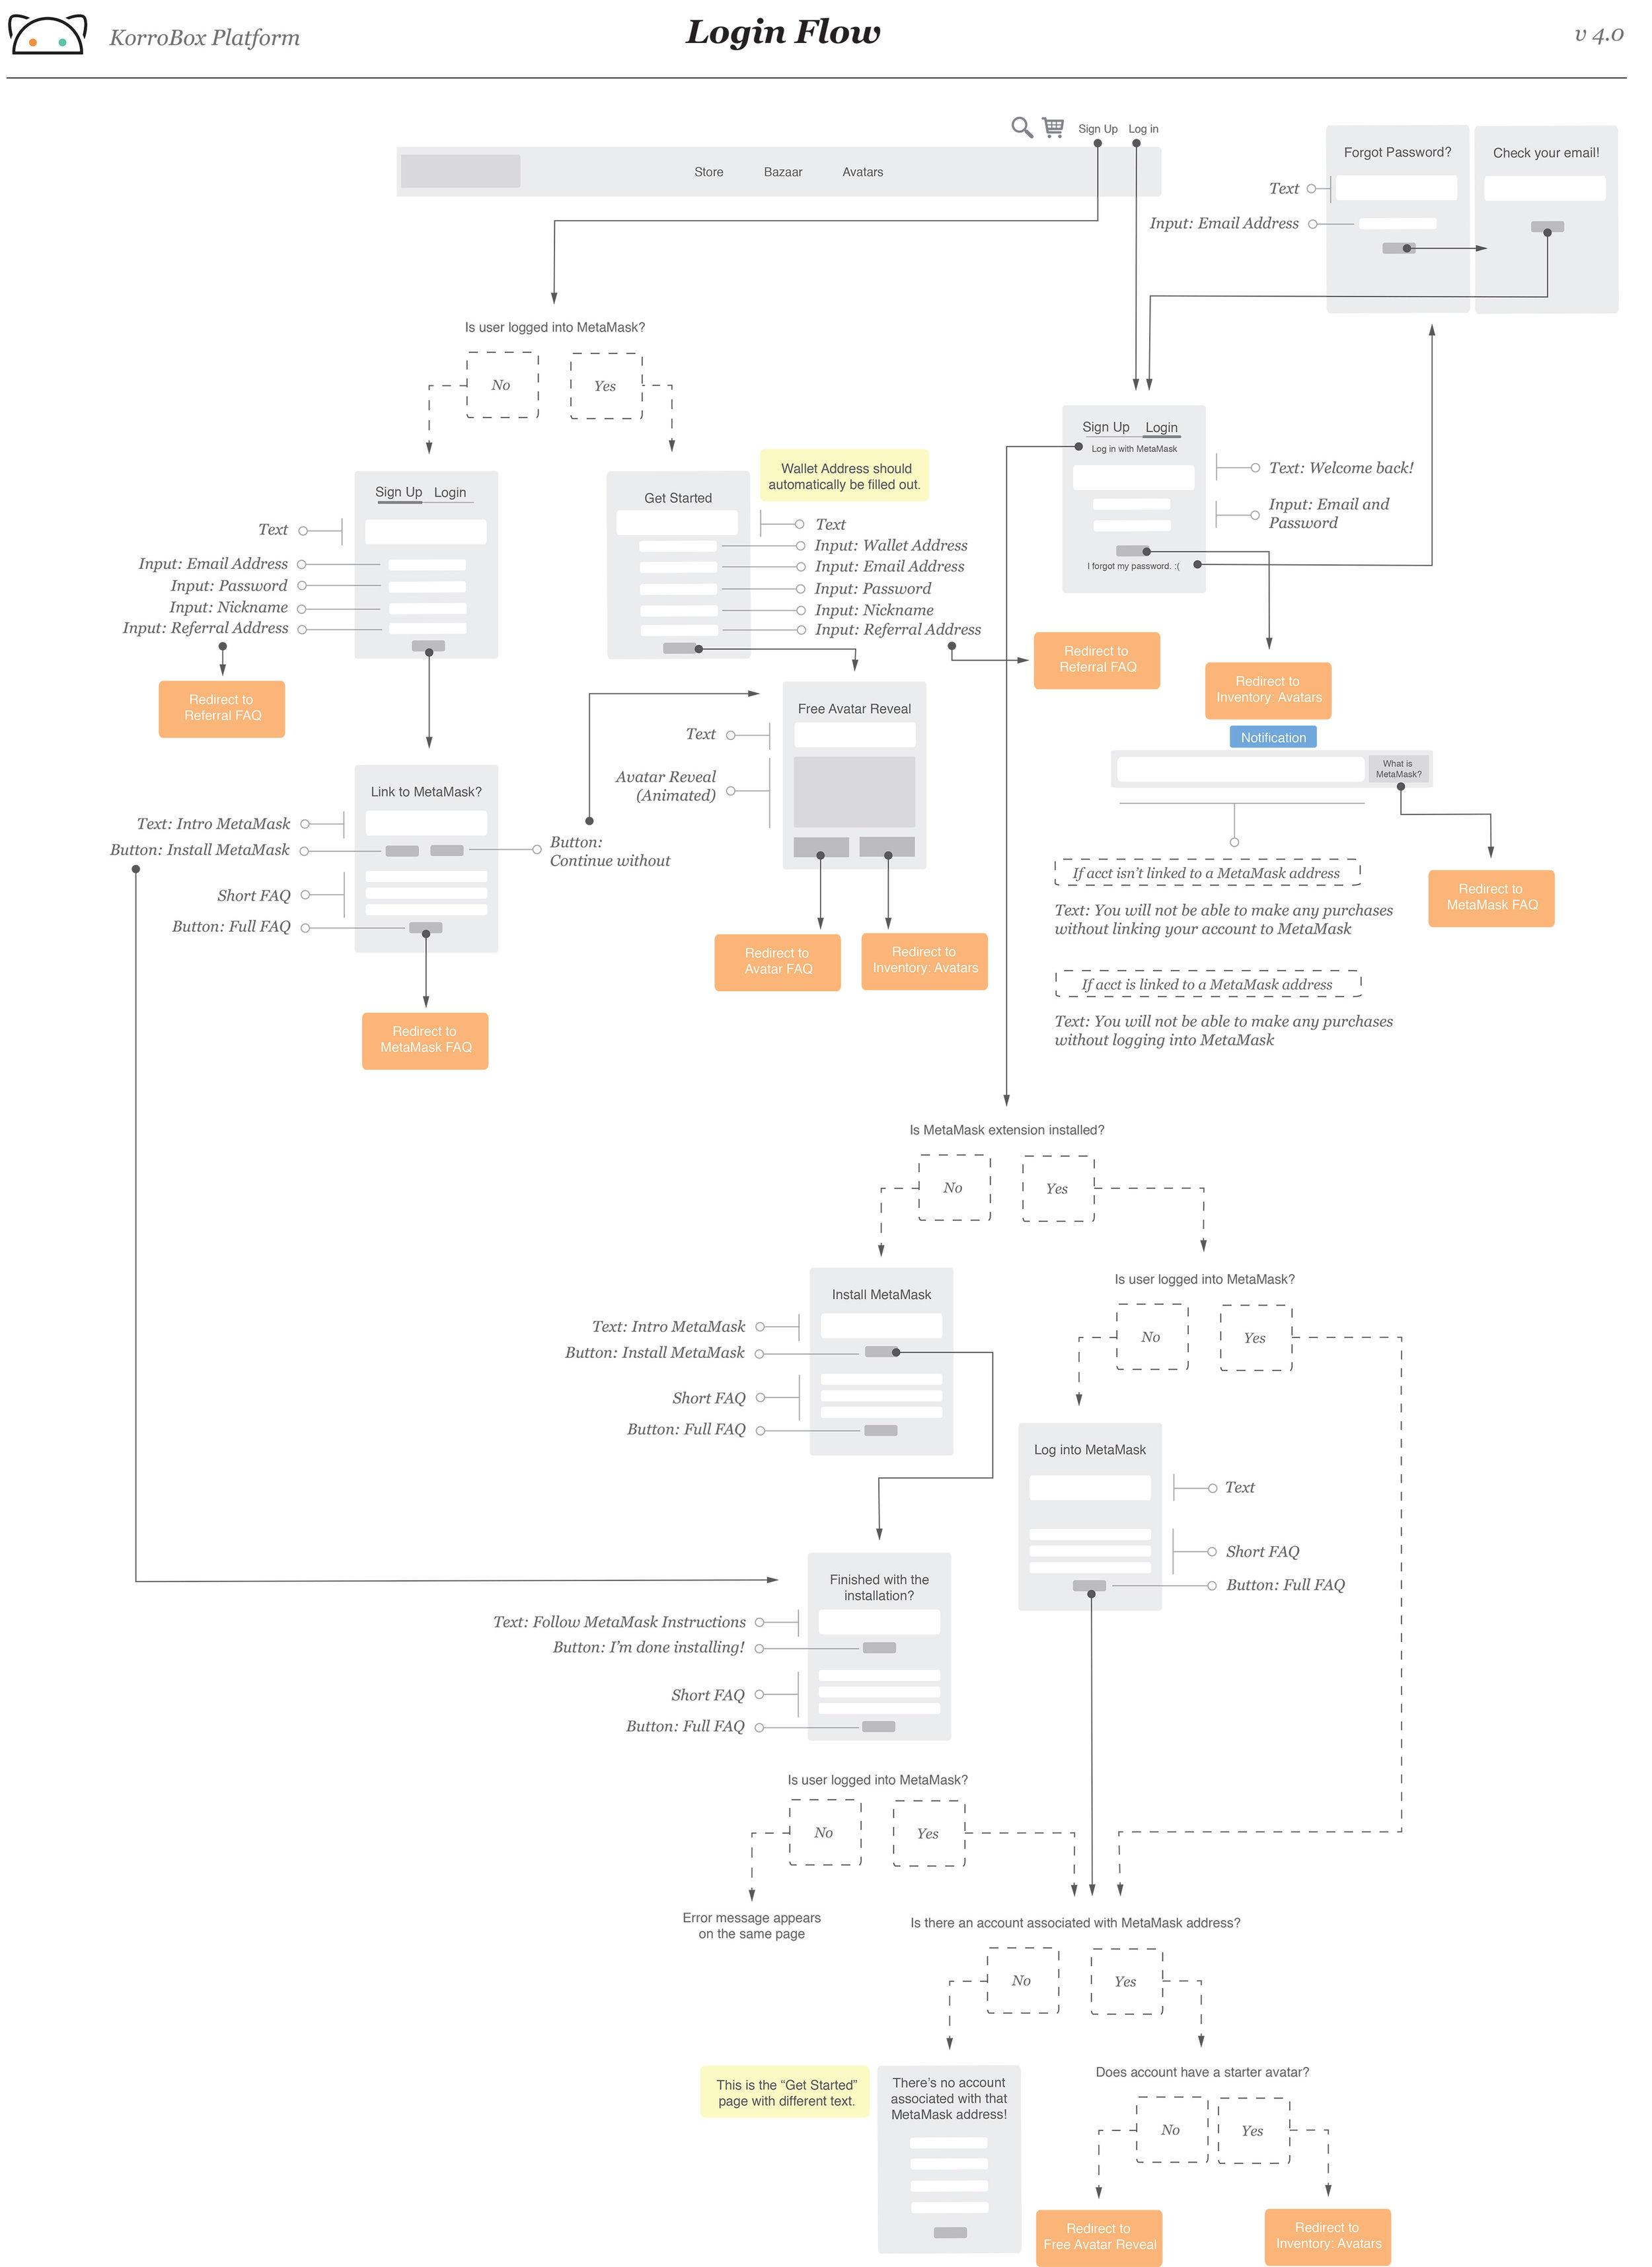 platform-uxflow-login.jpg